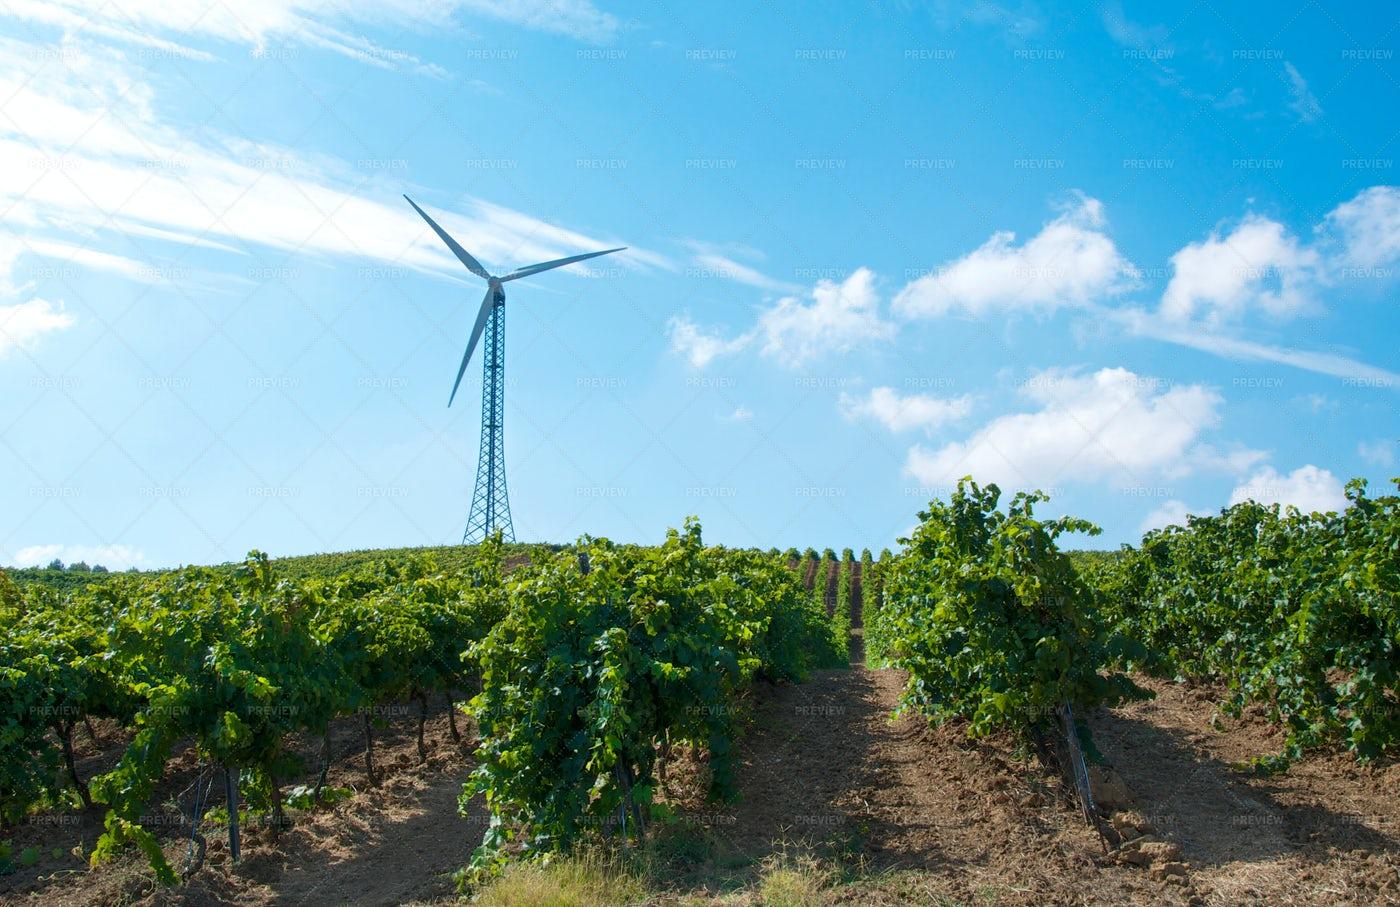 Wind Turbine In A Vineyard: Stock Photos